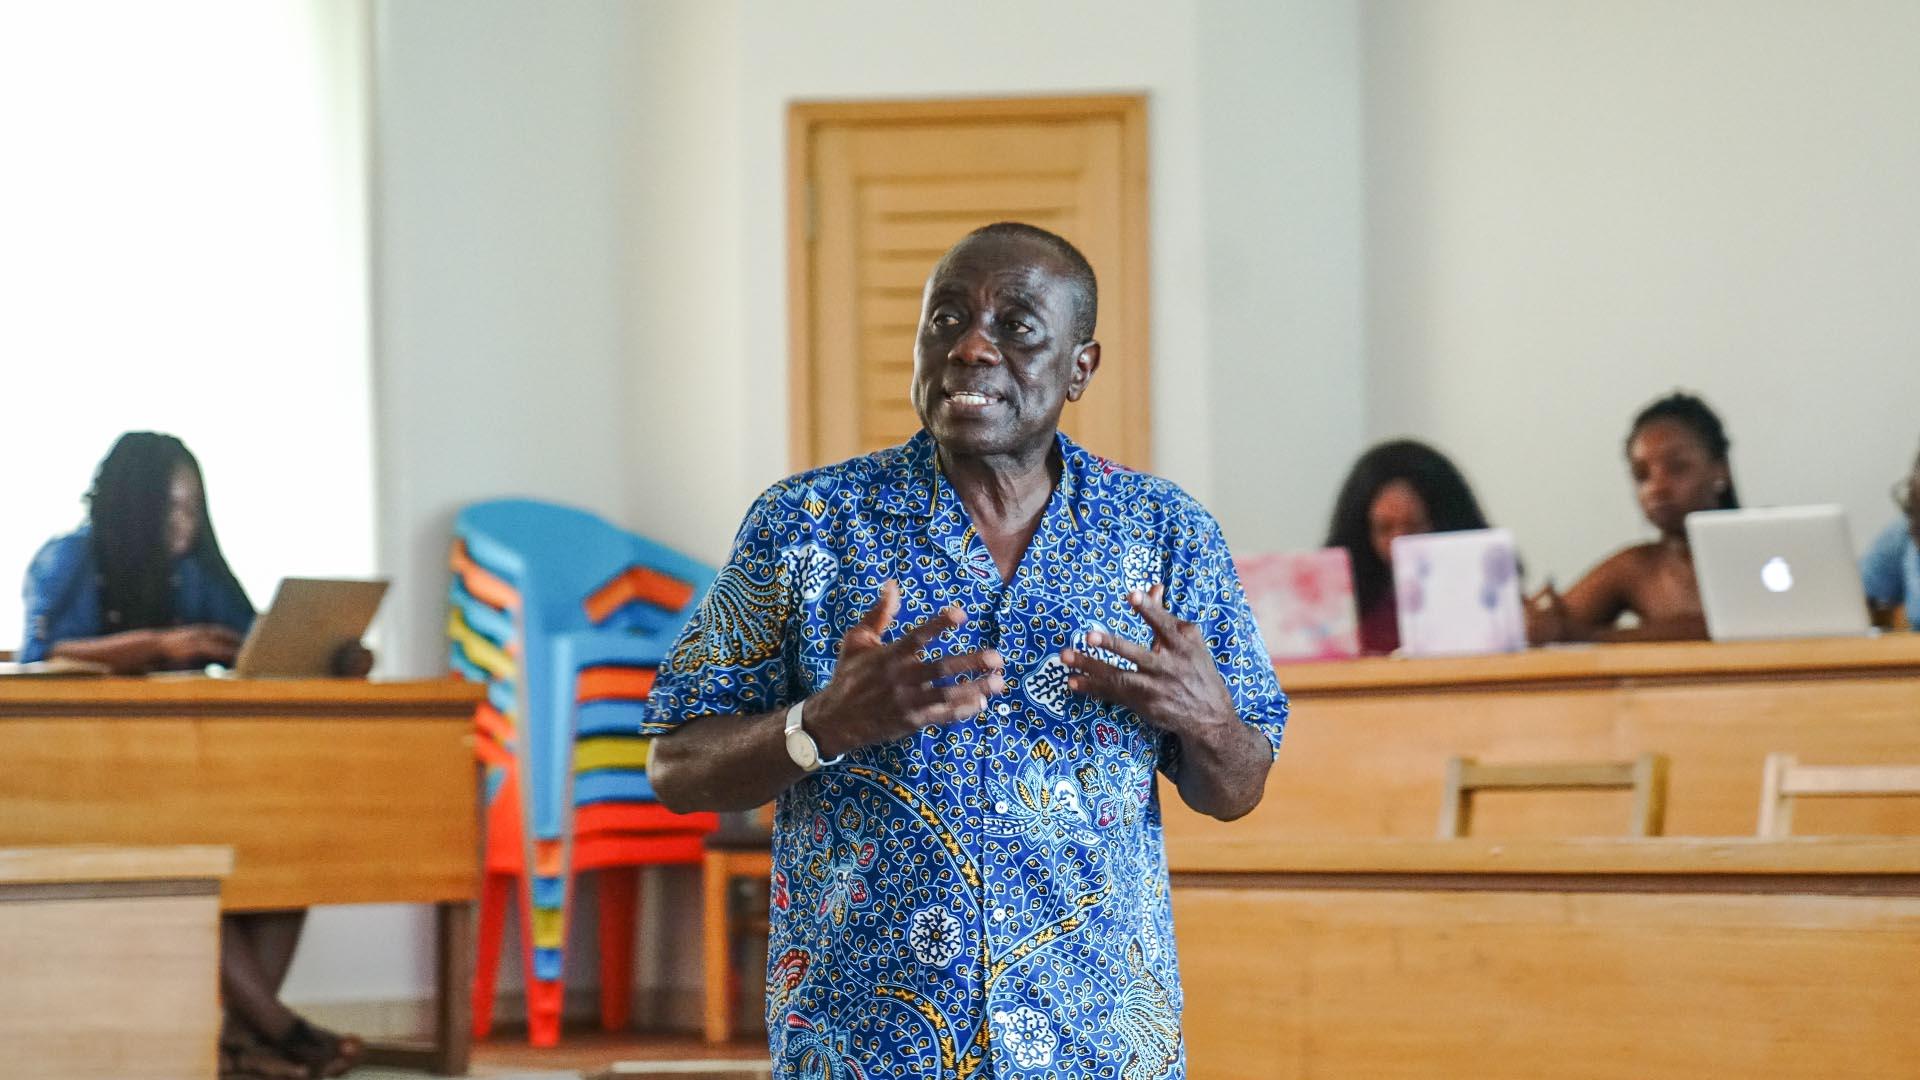 Ashesi Homecoming 2018 captured in Photos - Ashesi